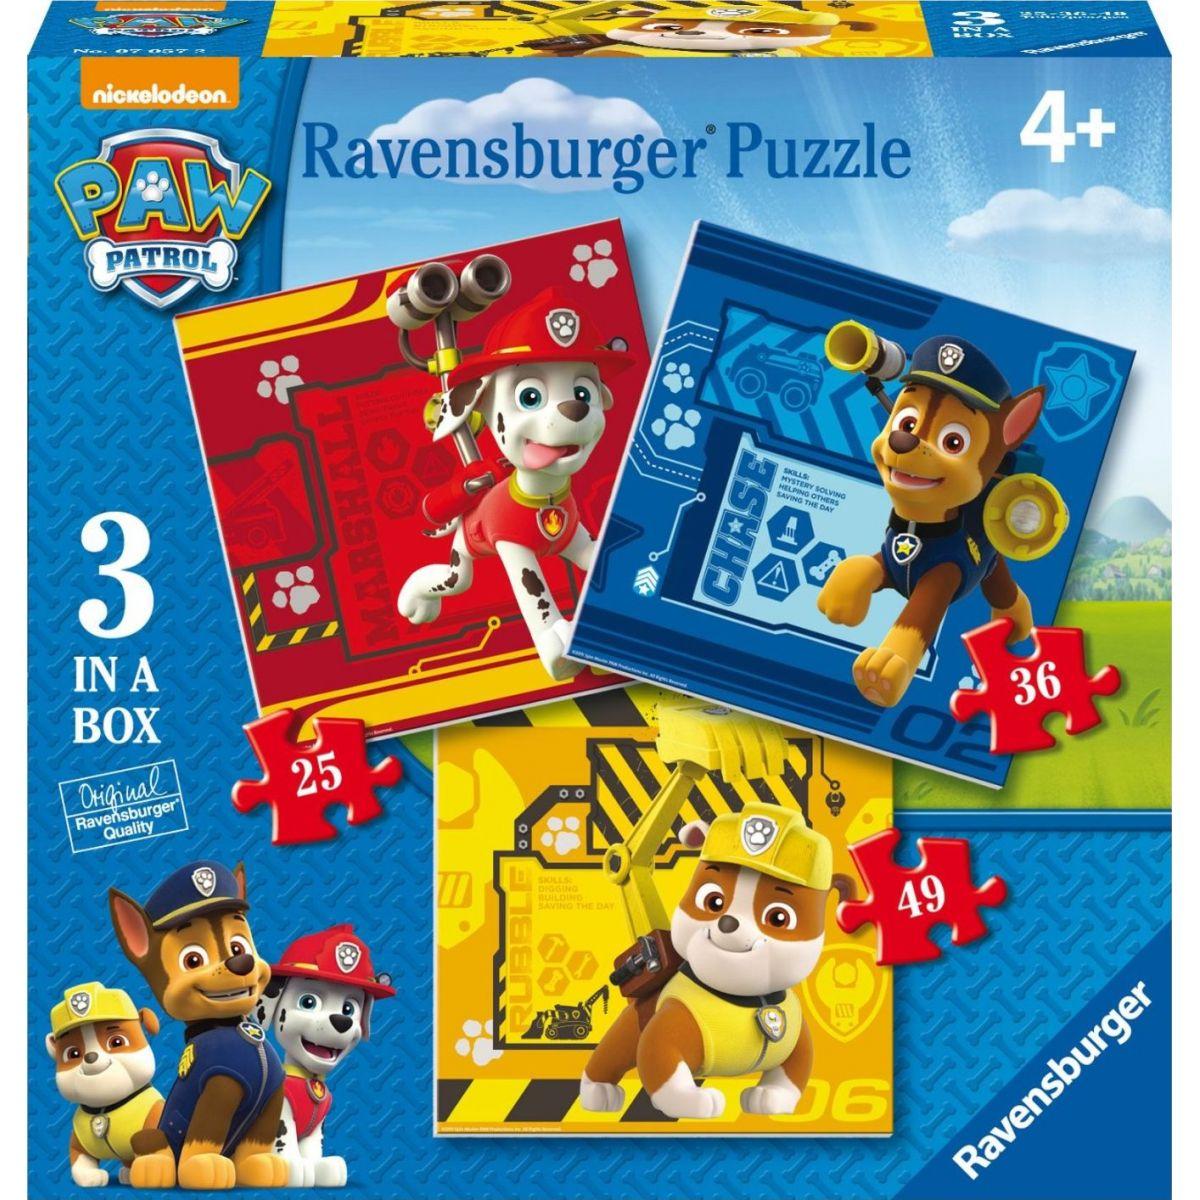 Ravensburger Tlapková Patrola: Rubble, Marshall & Chase puzzle 25,36,49 dílků